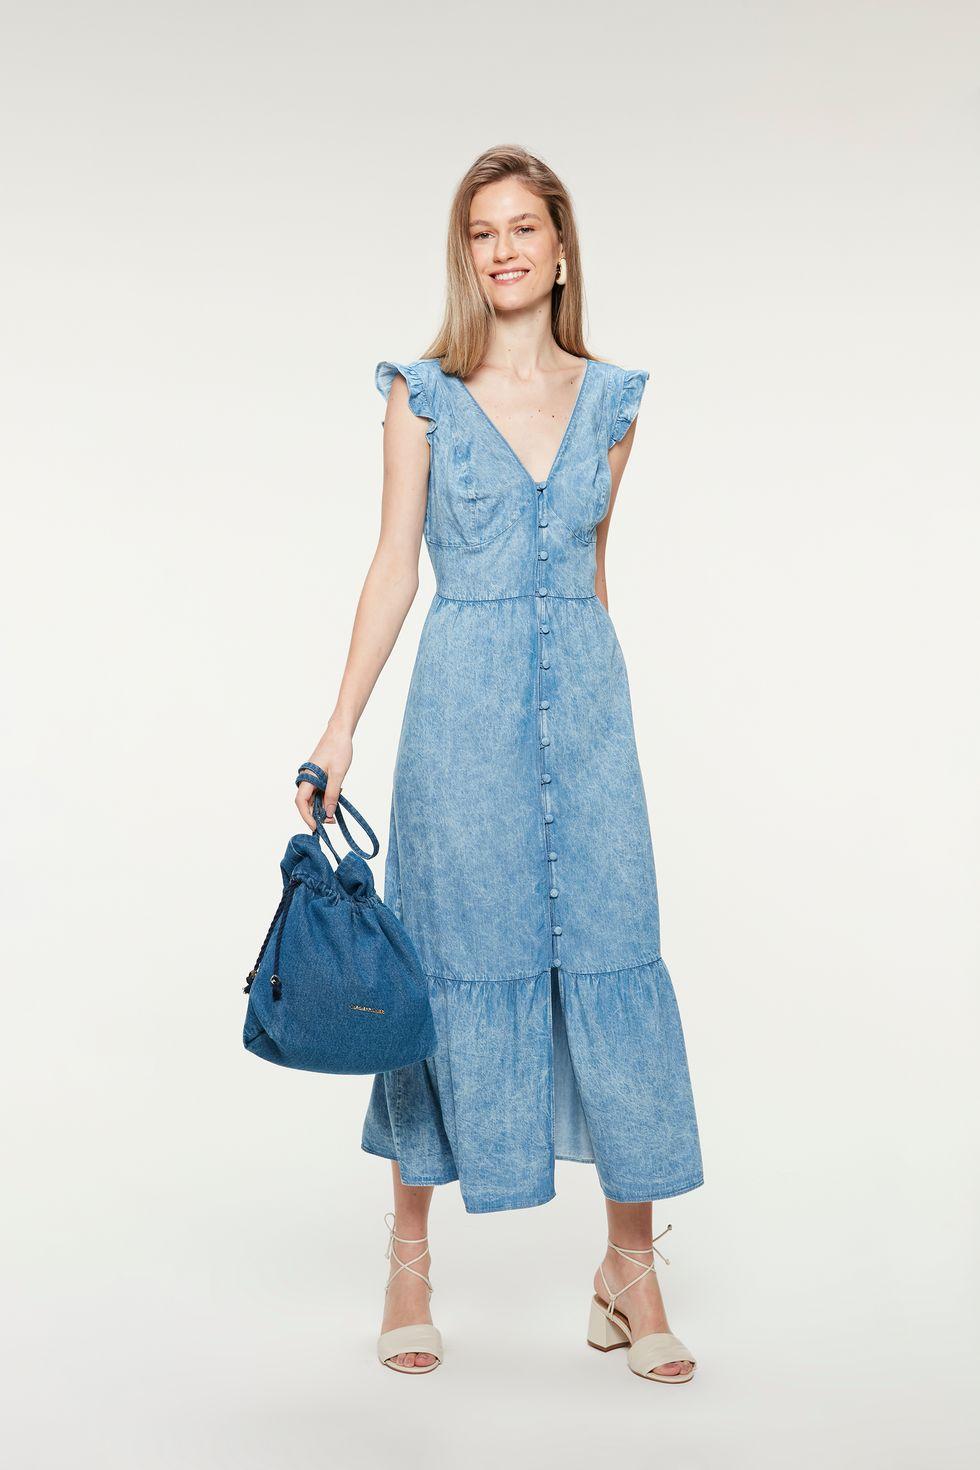 Vestido-Jeans-Midi-Marmorizado-Franzido-Frente--